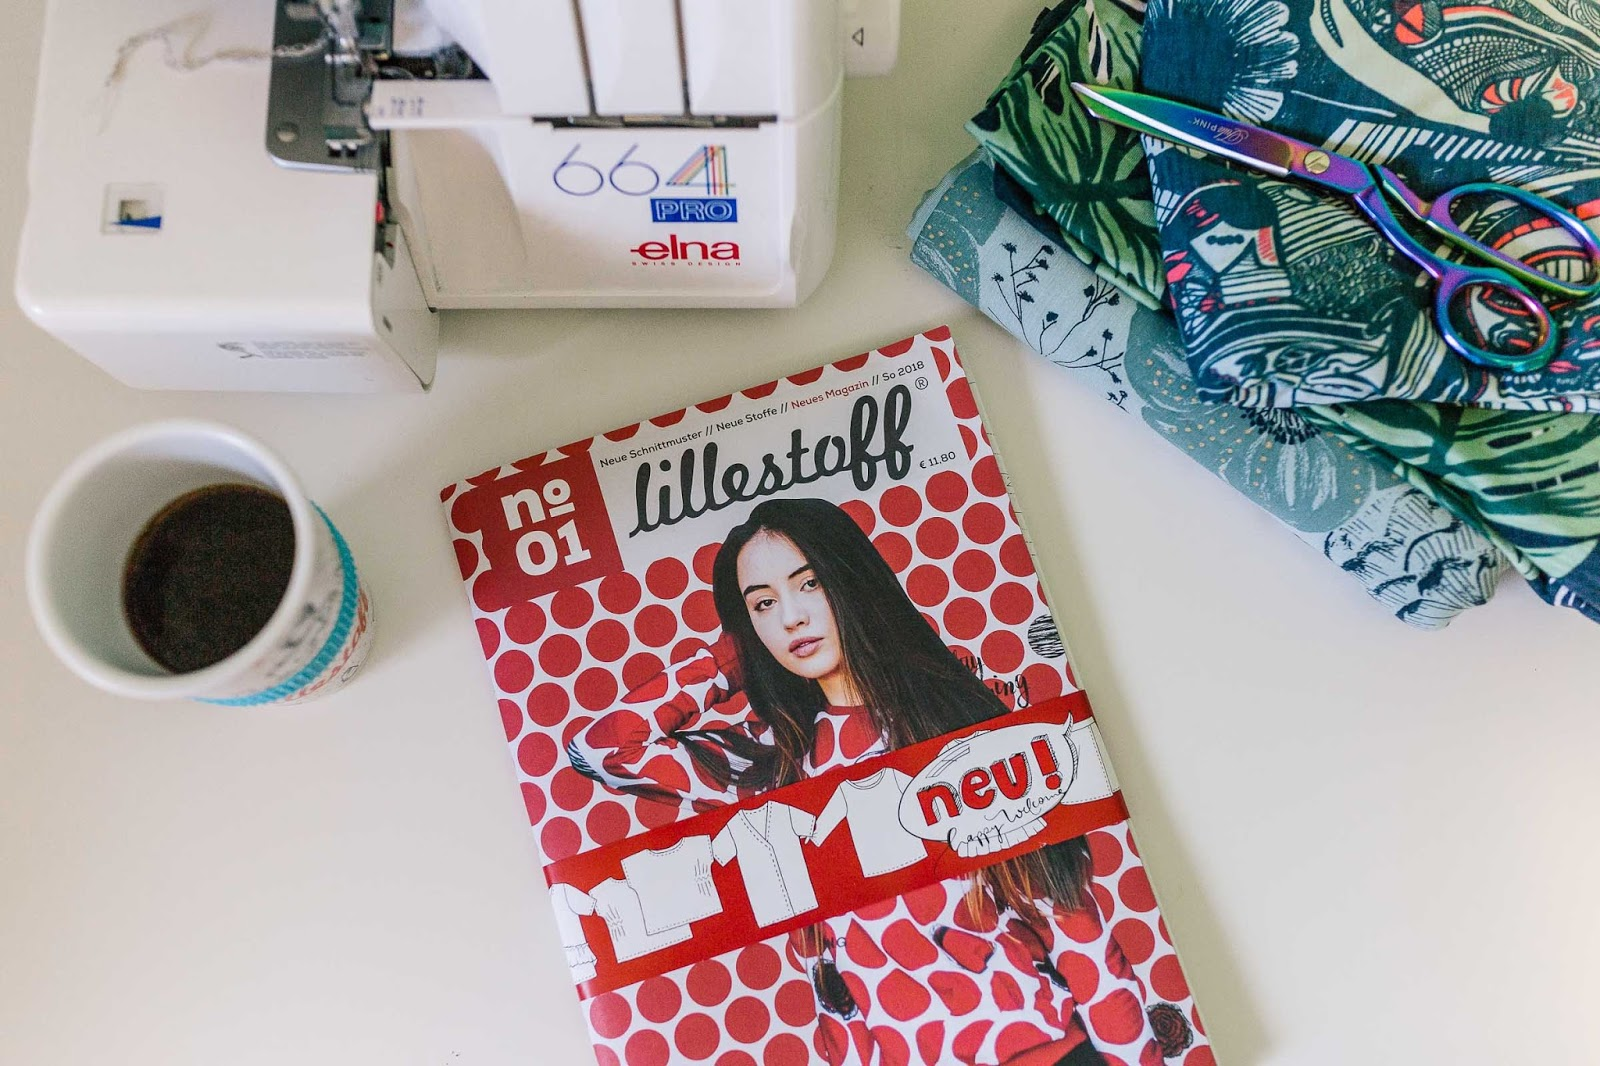 Lillestoff: Hurra - das lillestoff-Magazin ist da!